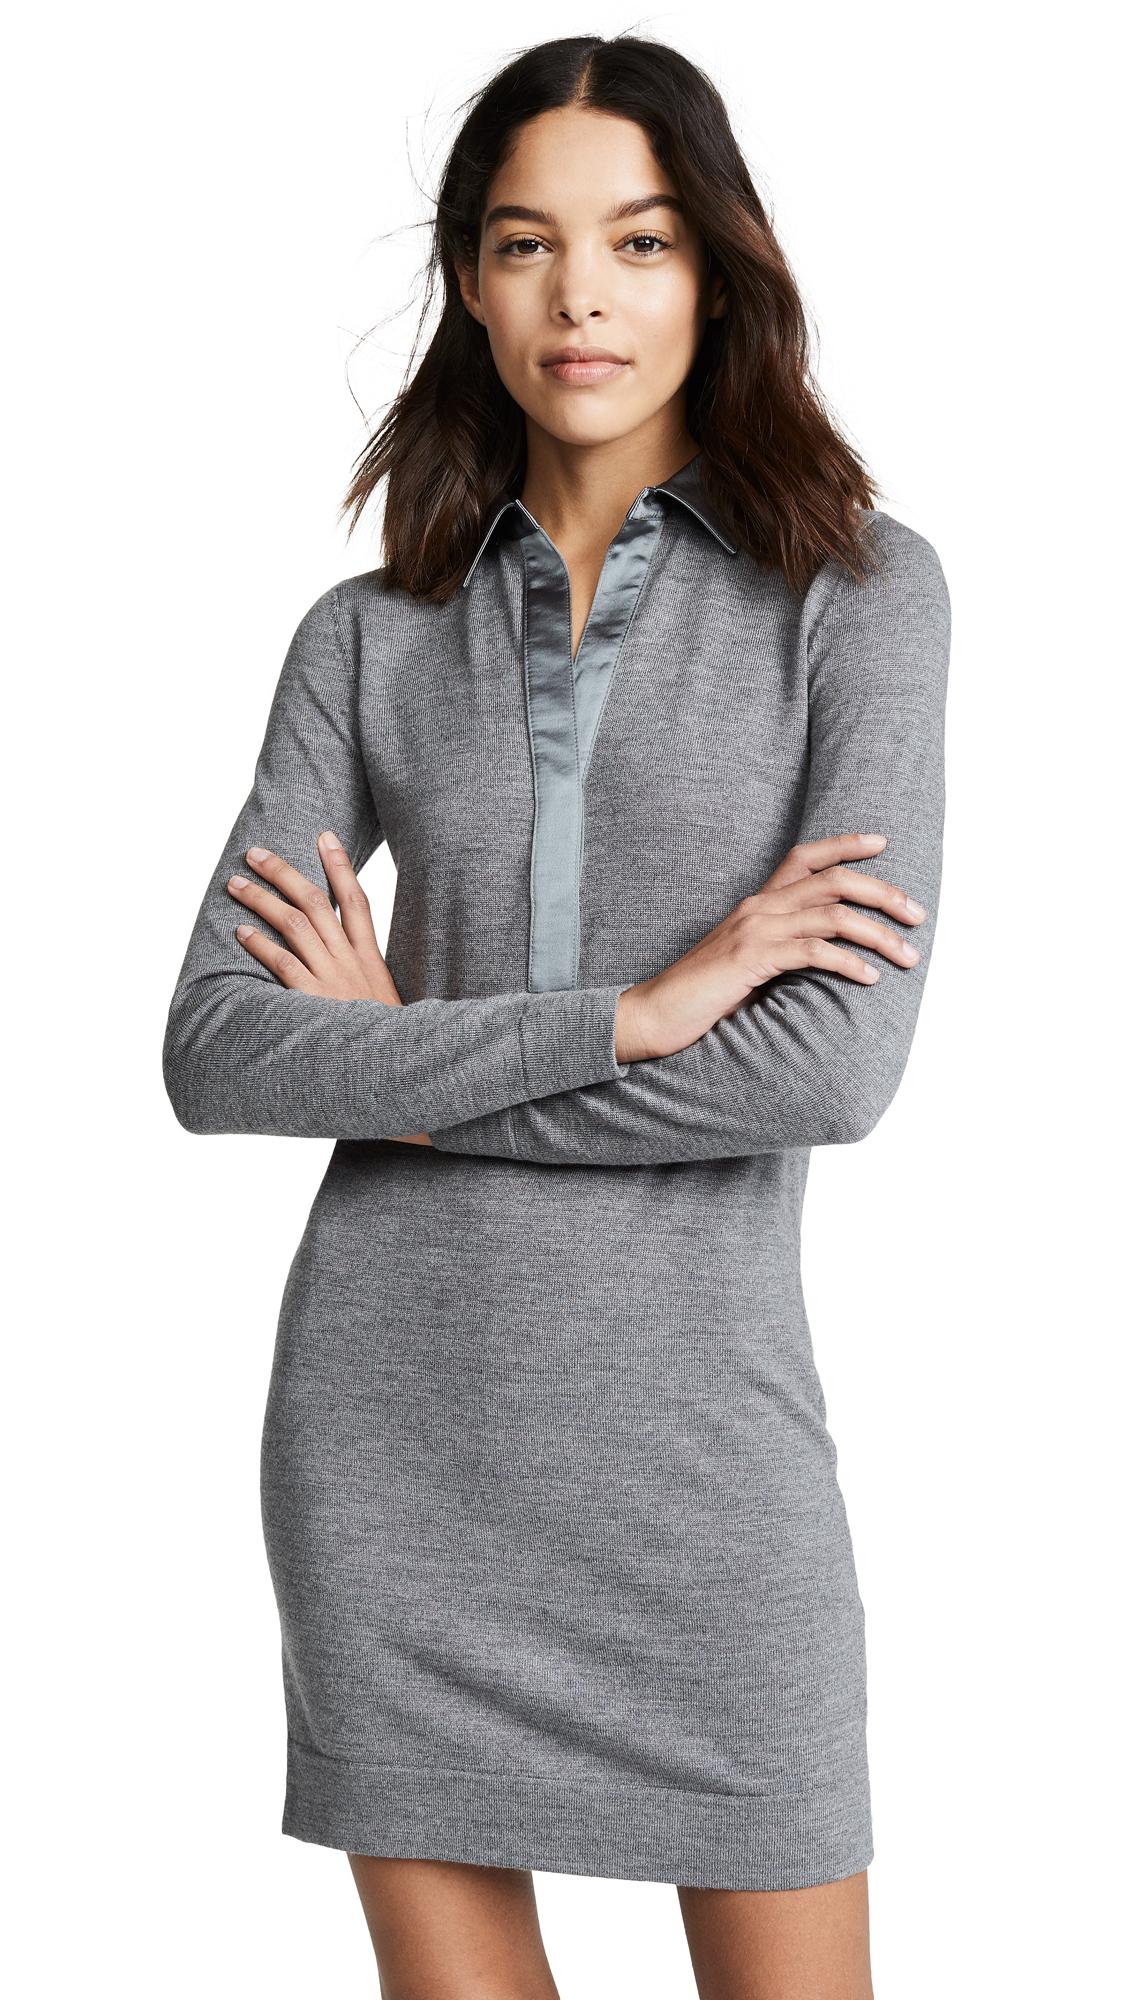 Club Monaco Sabrae Dress - Grey Mix/Grey